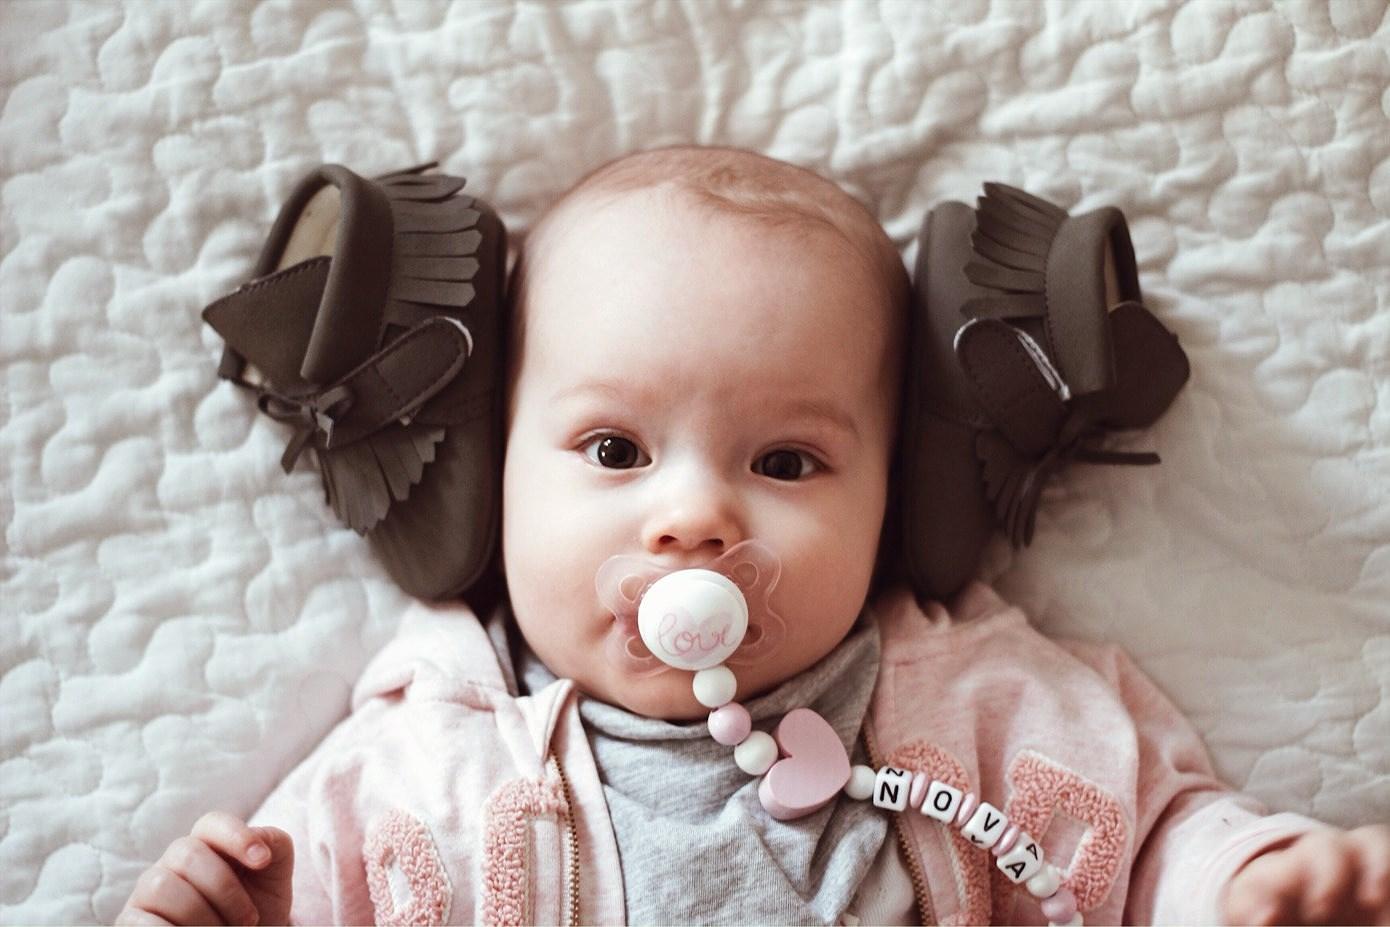 BabyMocs i påskpresent?